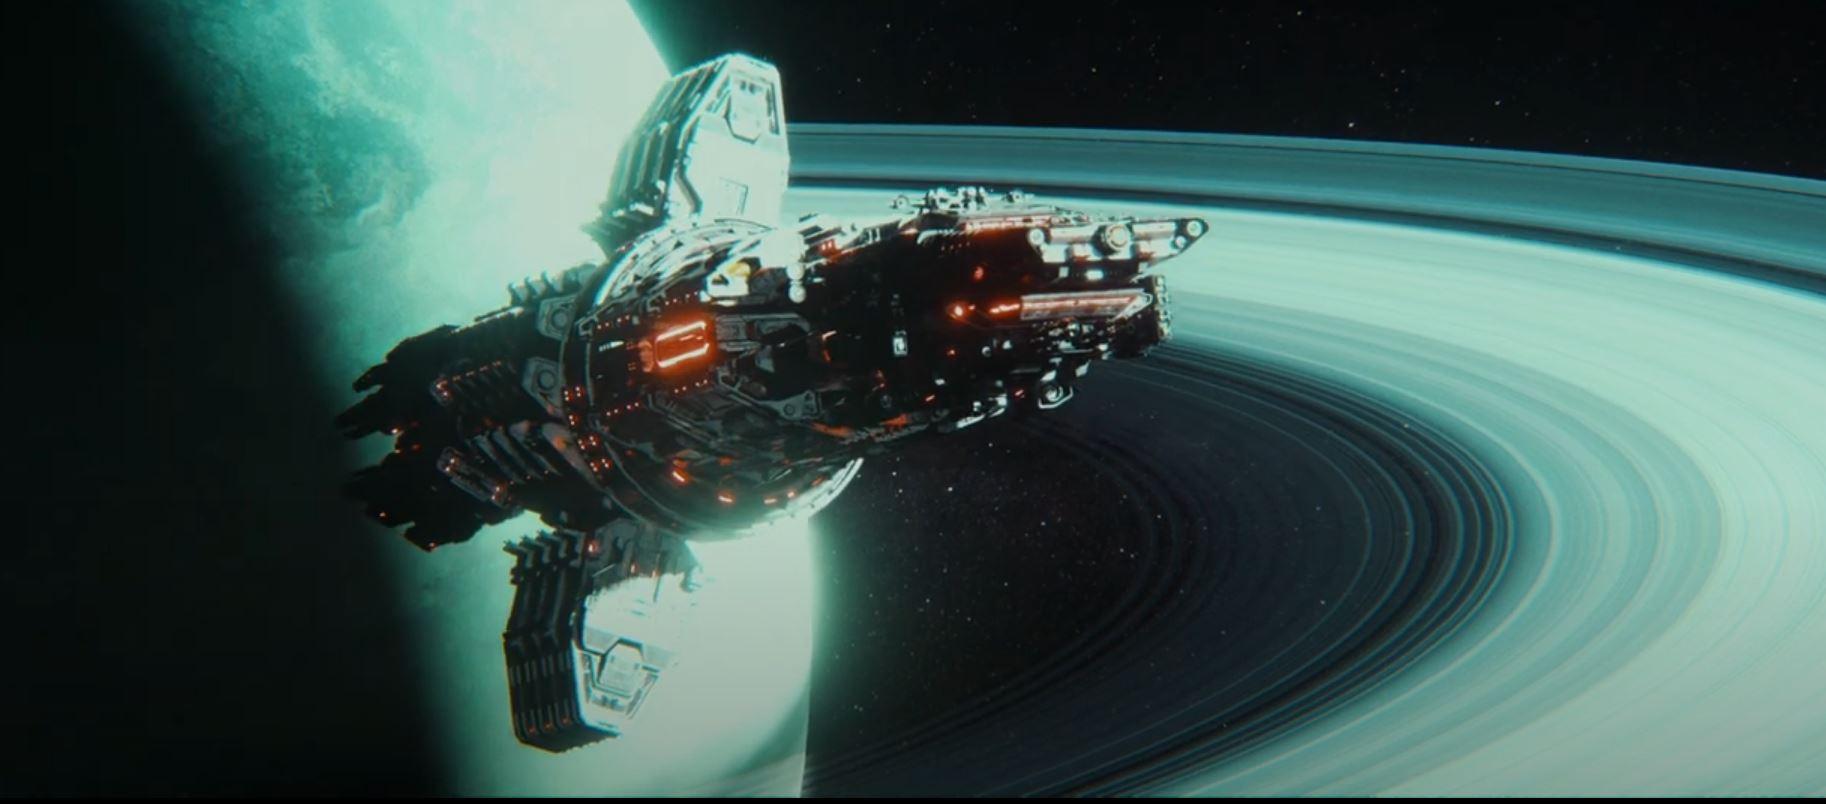 Короткометражка: фан-экранизация игры Among Us